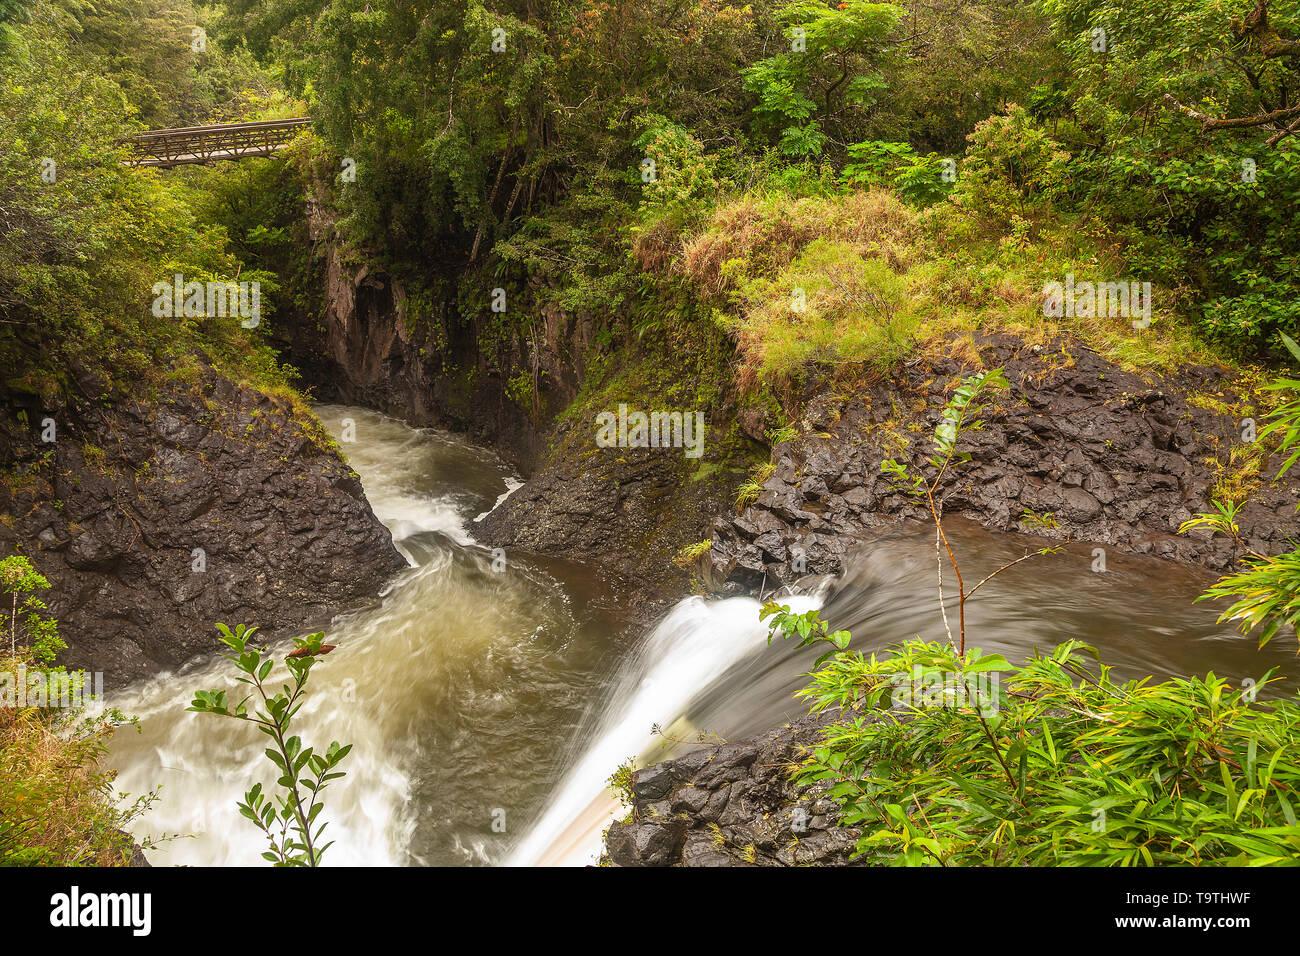 Palikea Stream and waterfalls, Haleakala National Park, Maui, Hawaii, USA Stock Photo